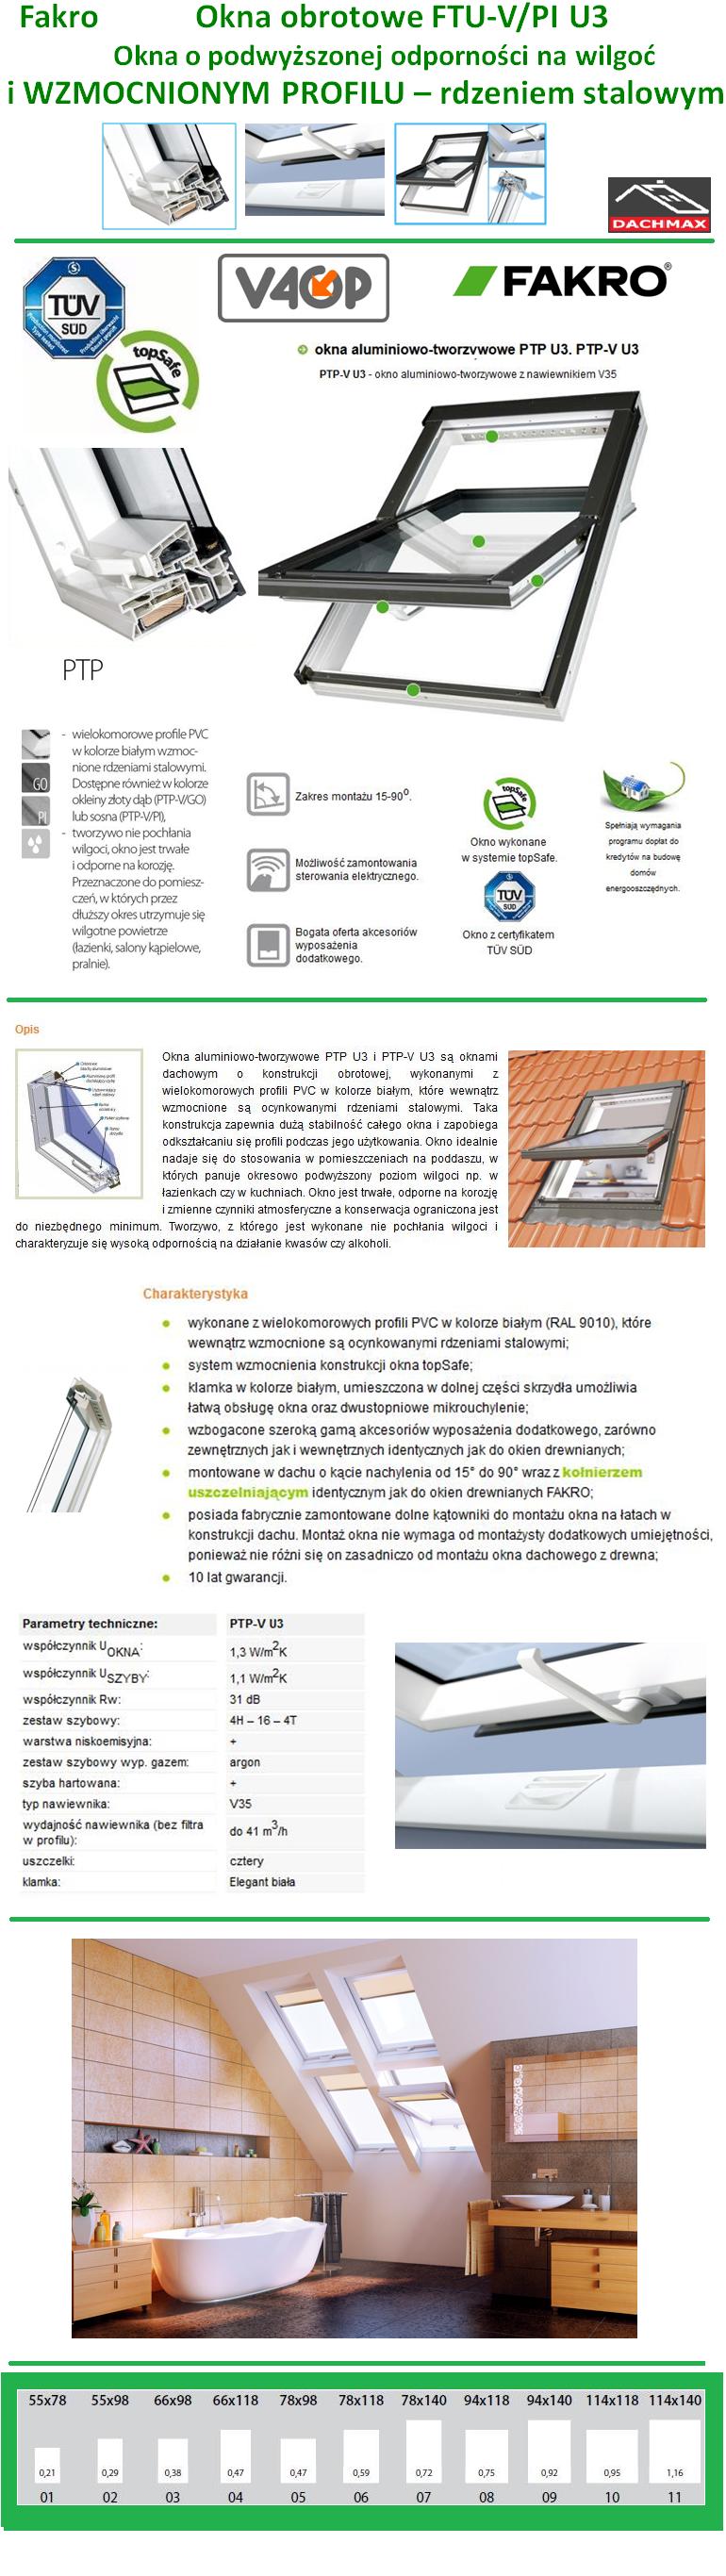 Okno Dachowe Fakro PTP-V/PI U3 PCV Białe O Wzmocnionej Konstrukcji Obrotowe